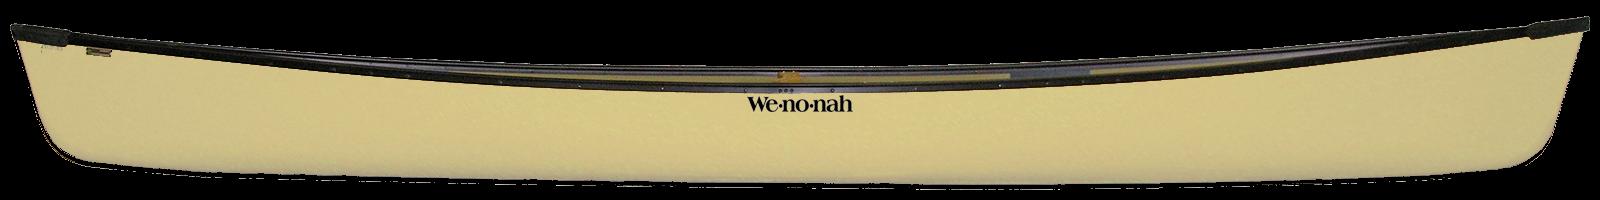 Wenonah Argosy - ORDER NEW